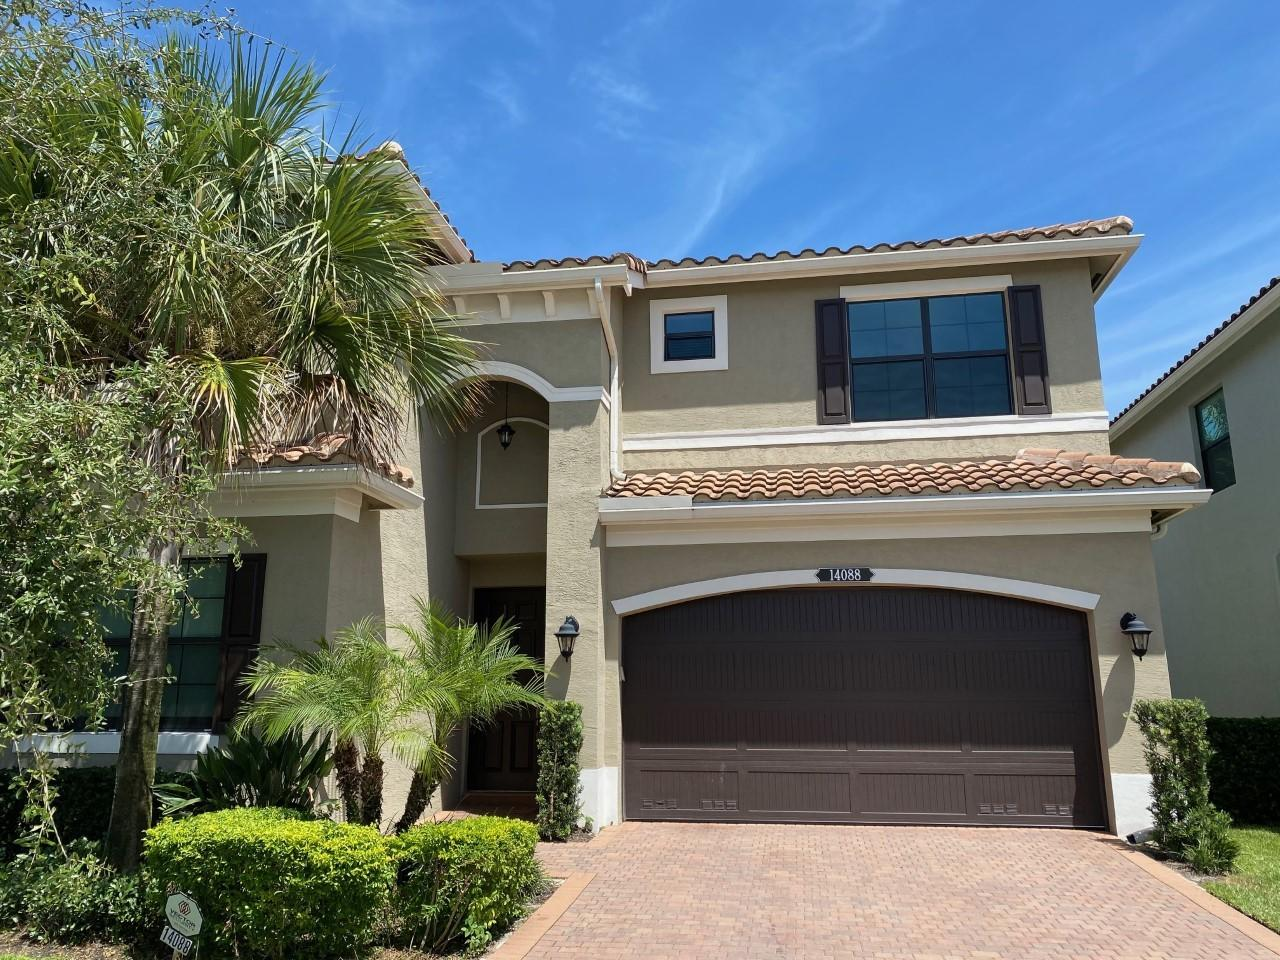 Details for 14088 Rock Salt Road, Delray Beach, FL 33446